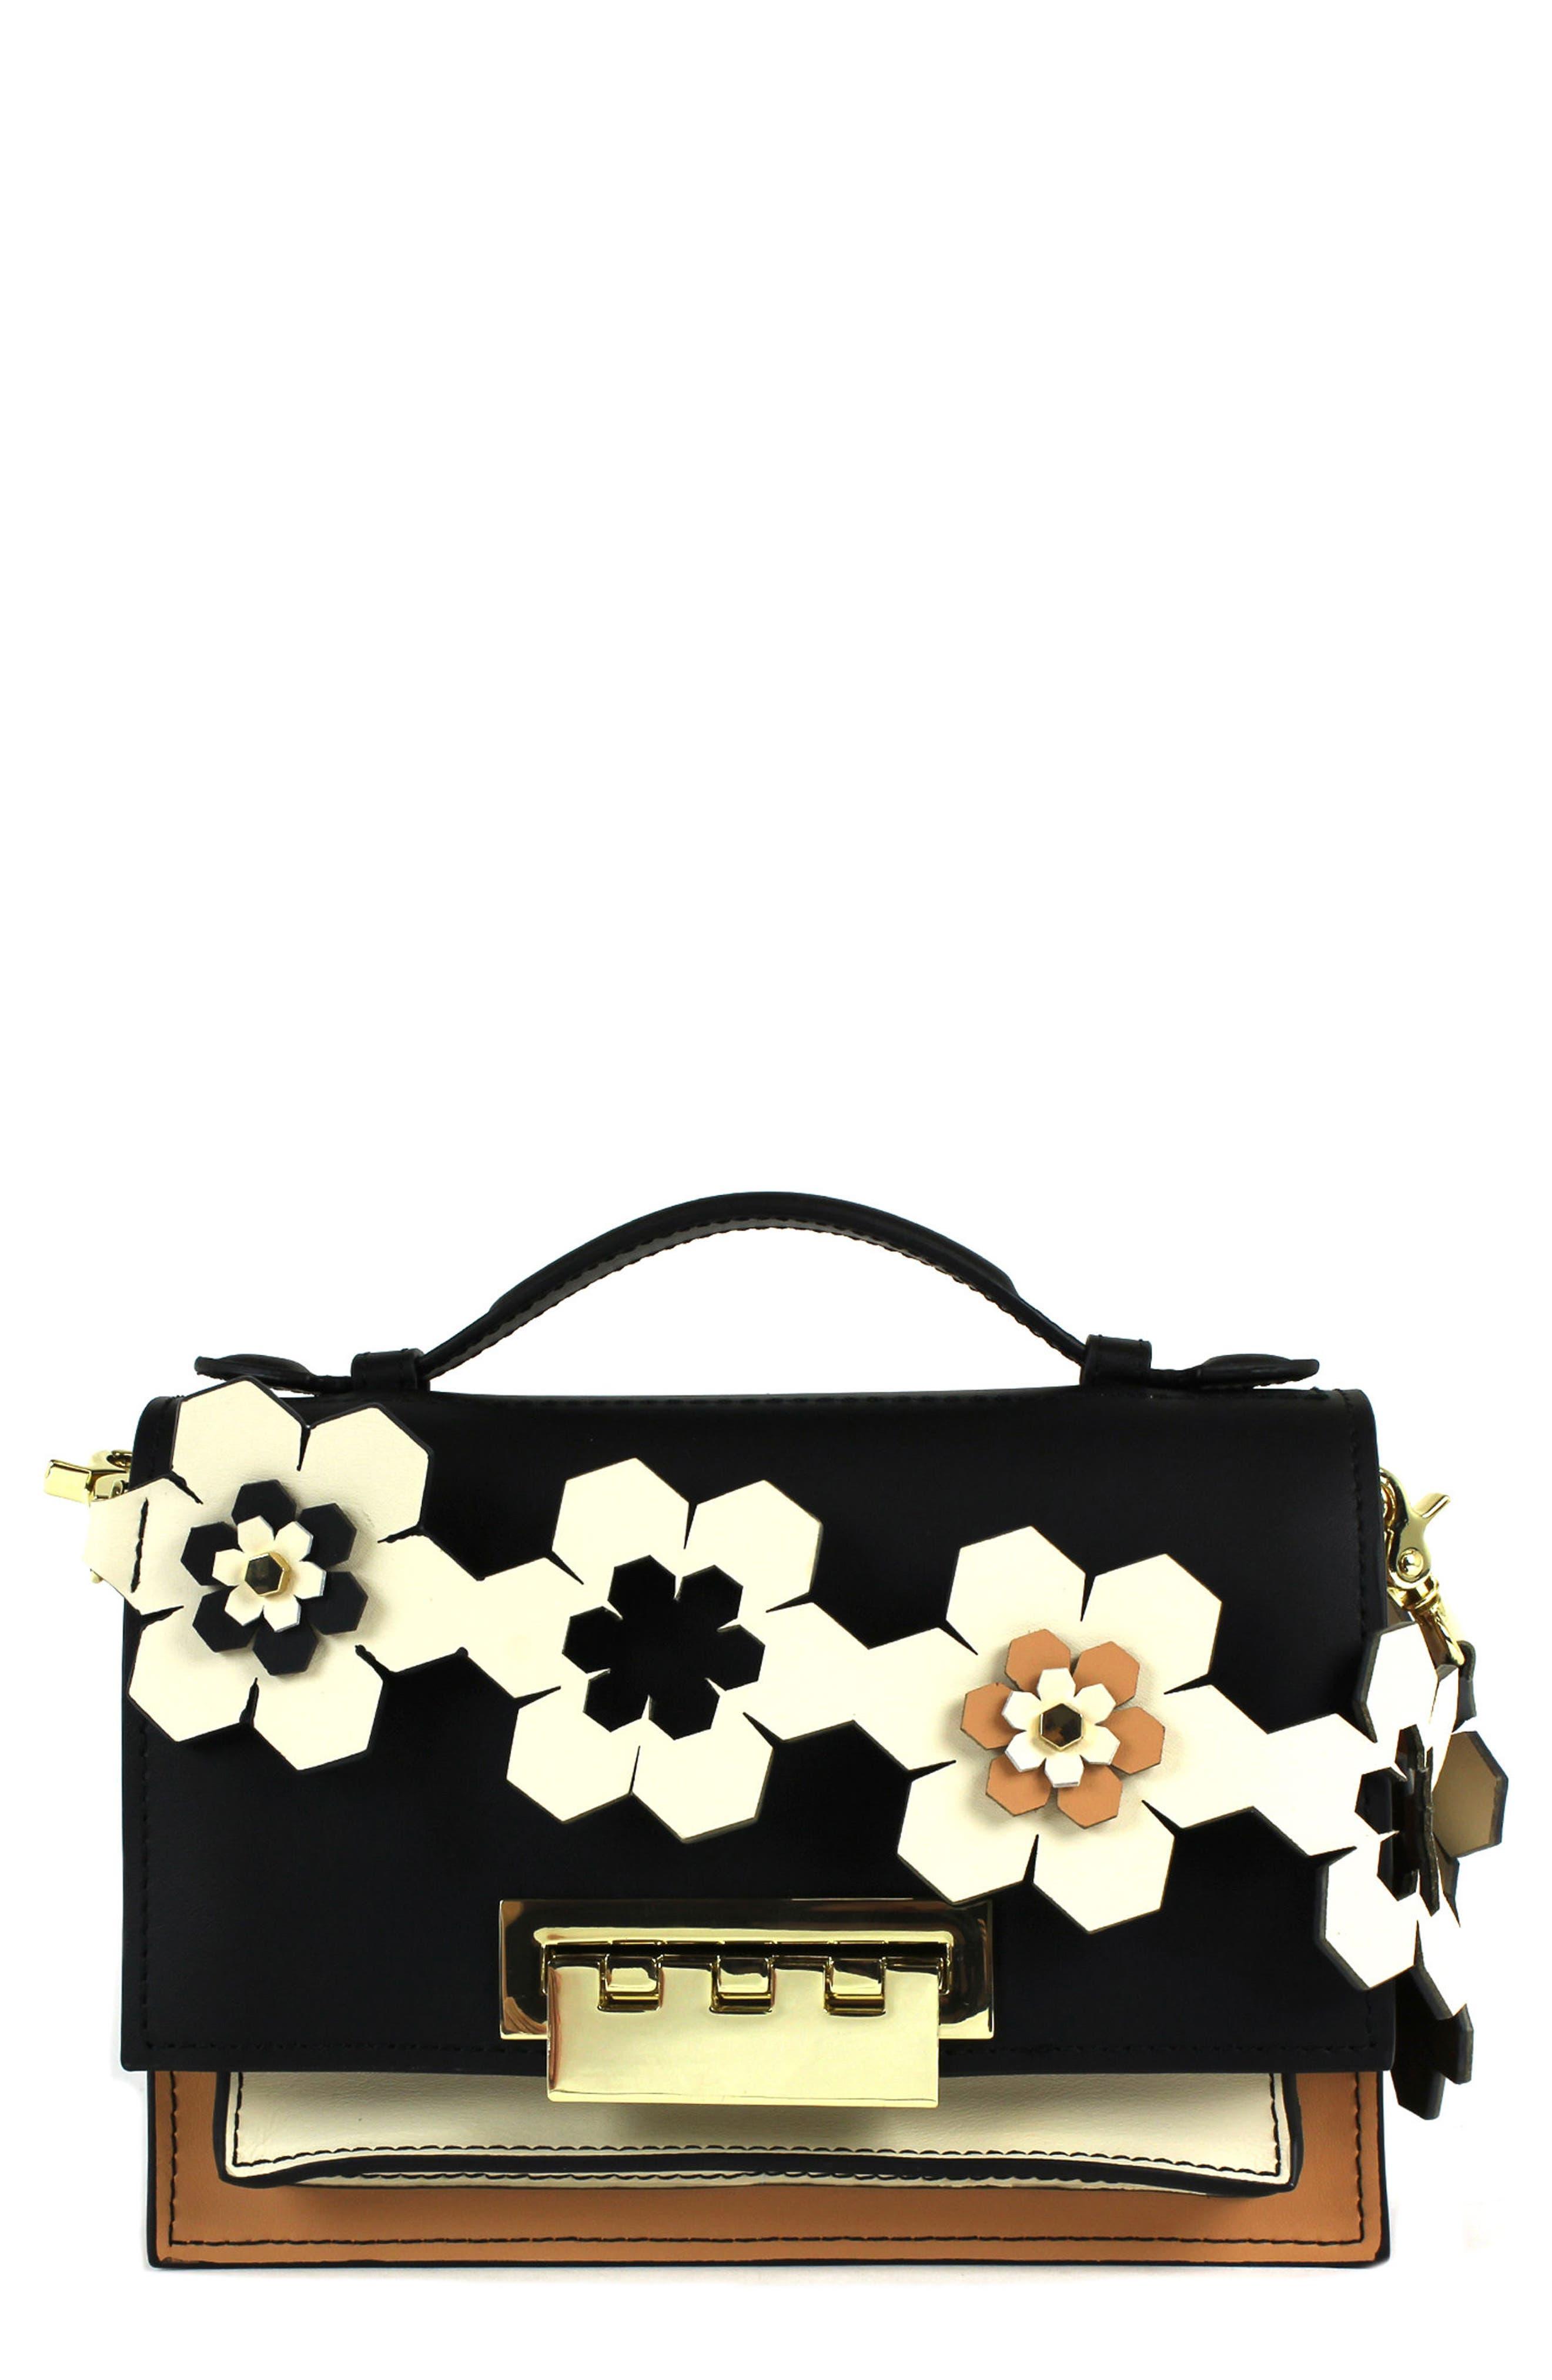 Earthette Calfskin Leather Accordion Shoulder Bag,                         Main,                         color,